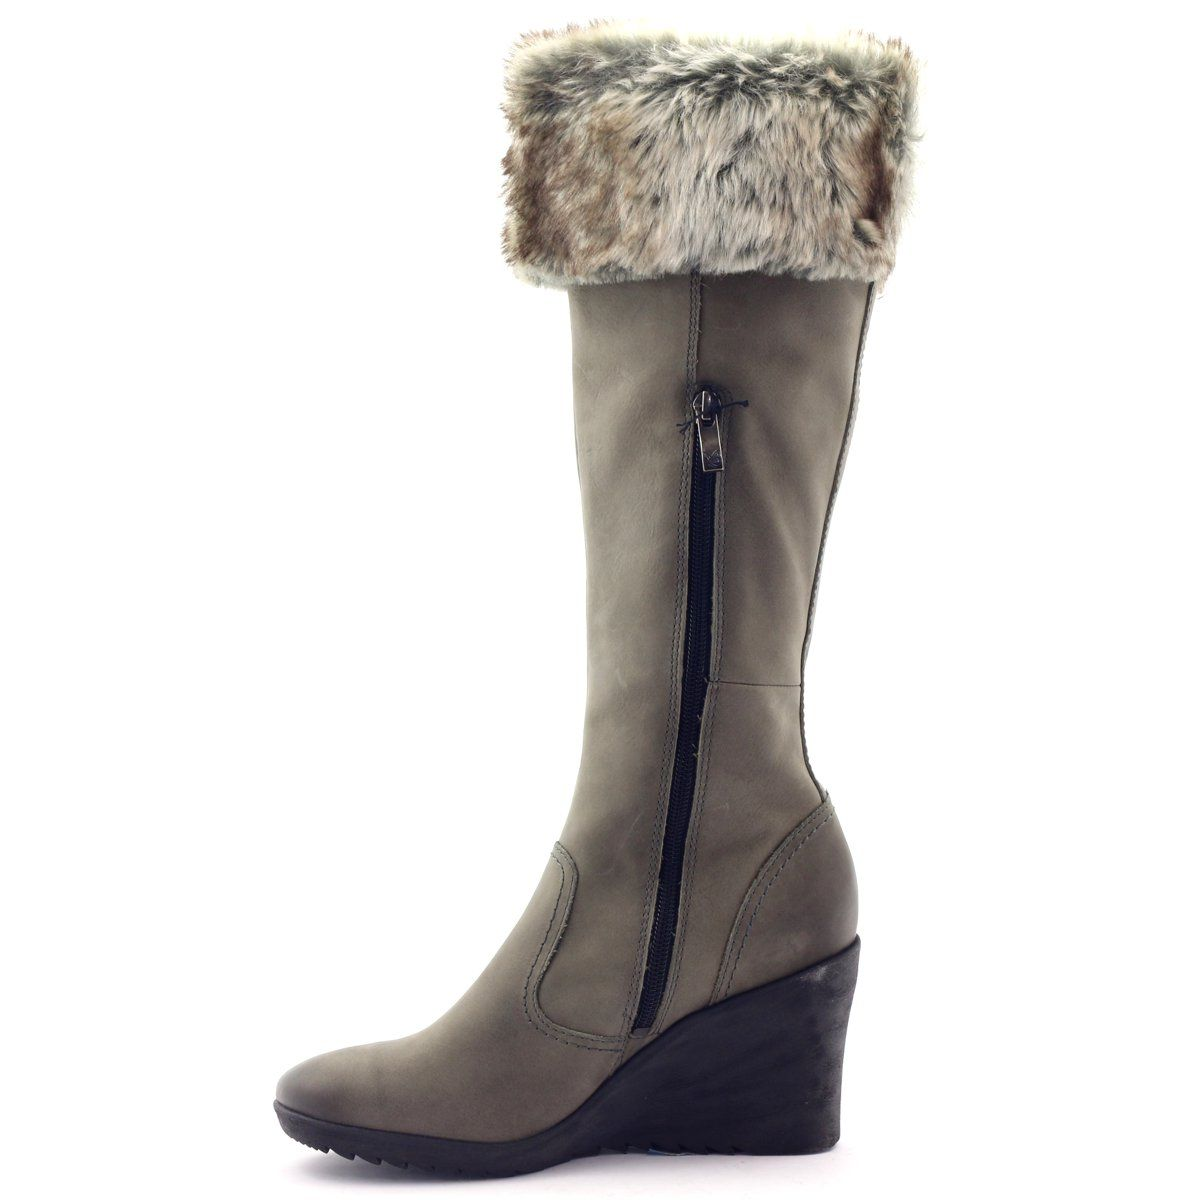 Caprice Kozaki Buty Damskie Skorzane 25607 Szare Boots Shoes Fashion